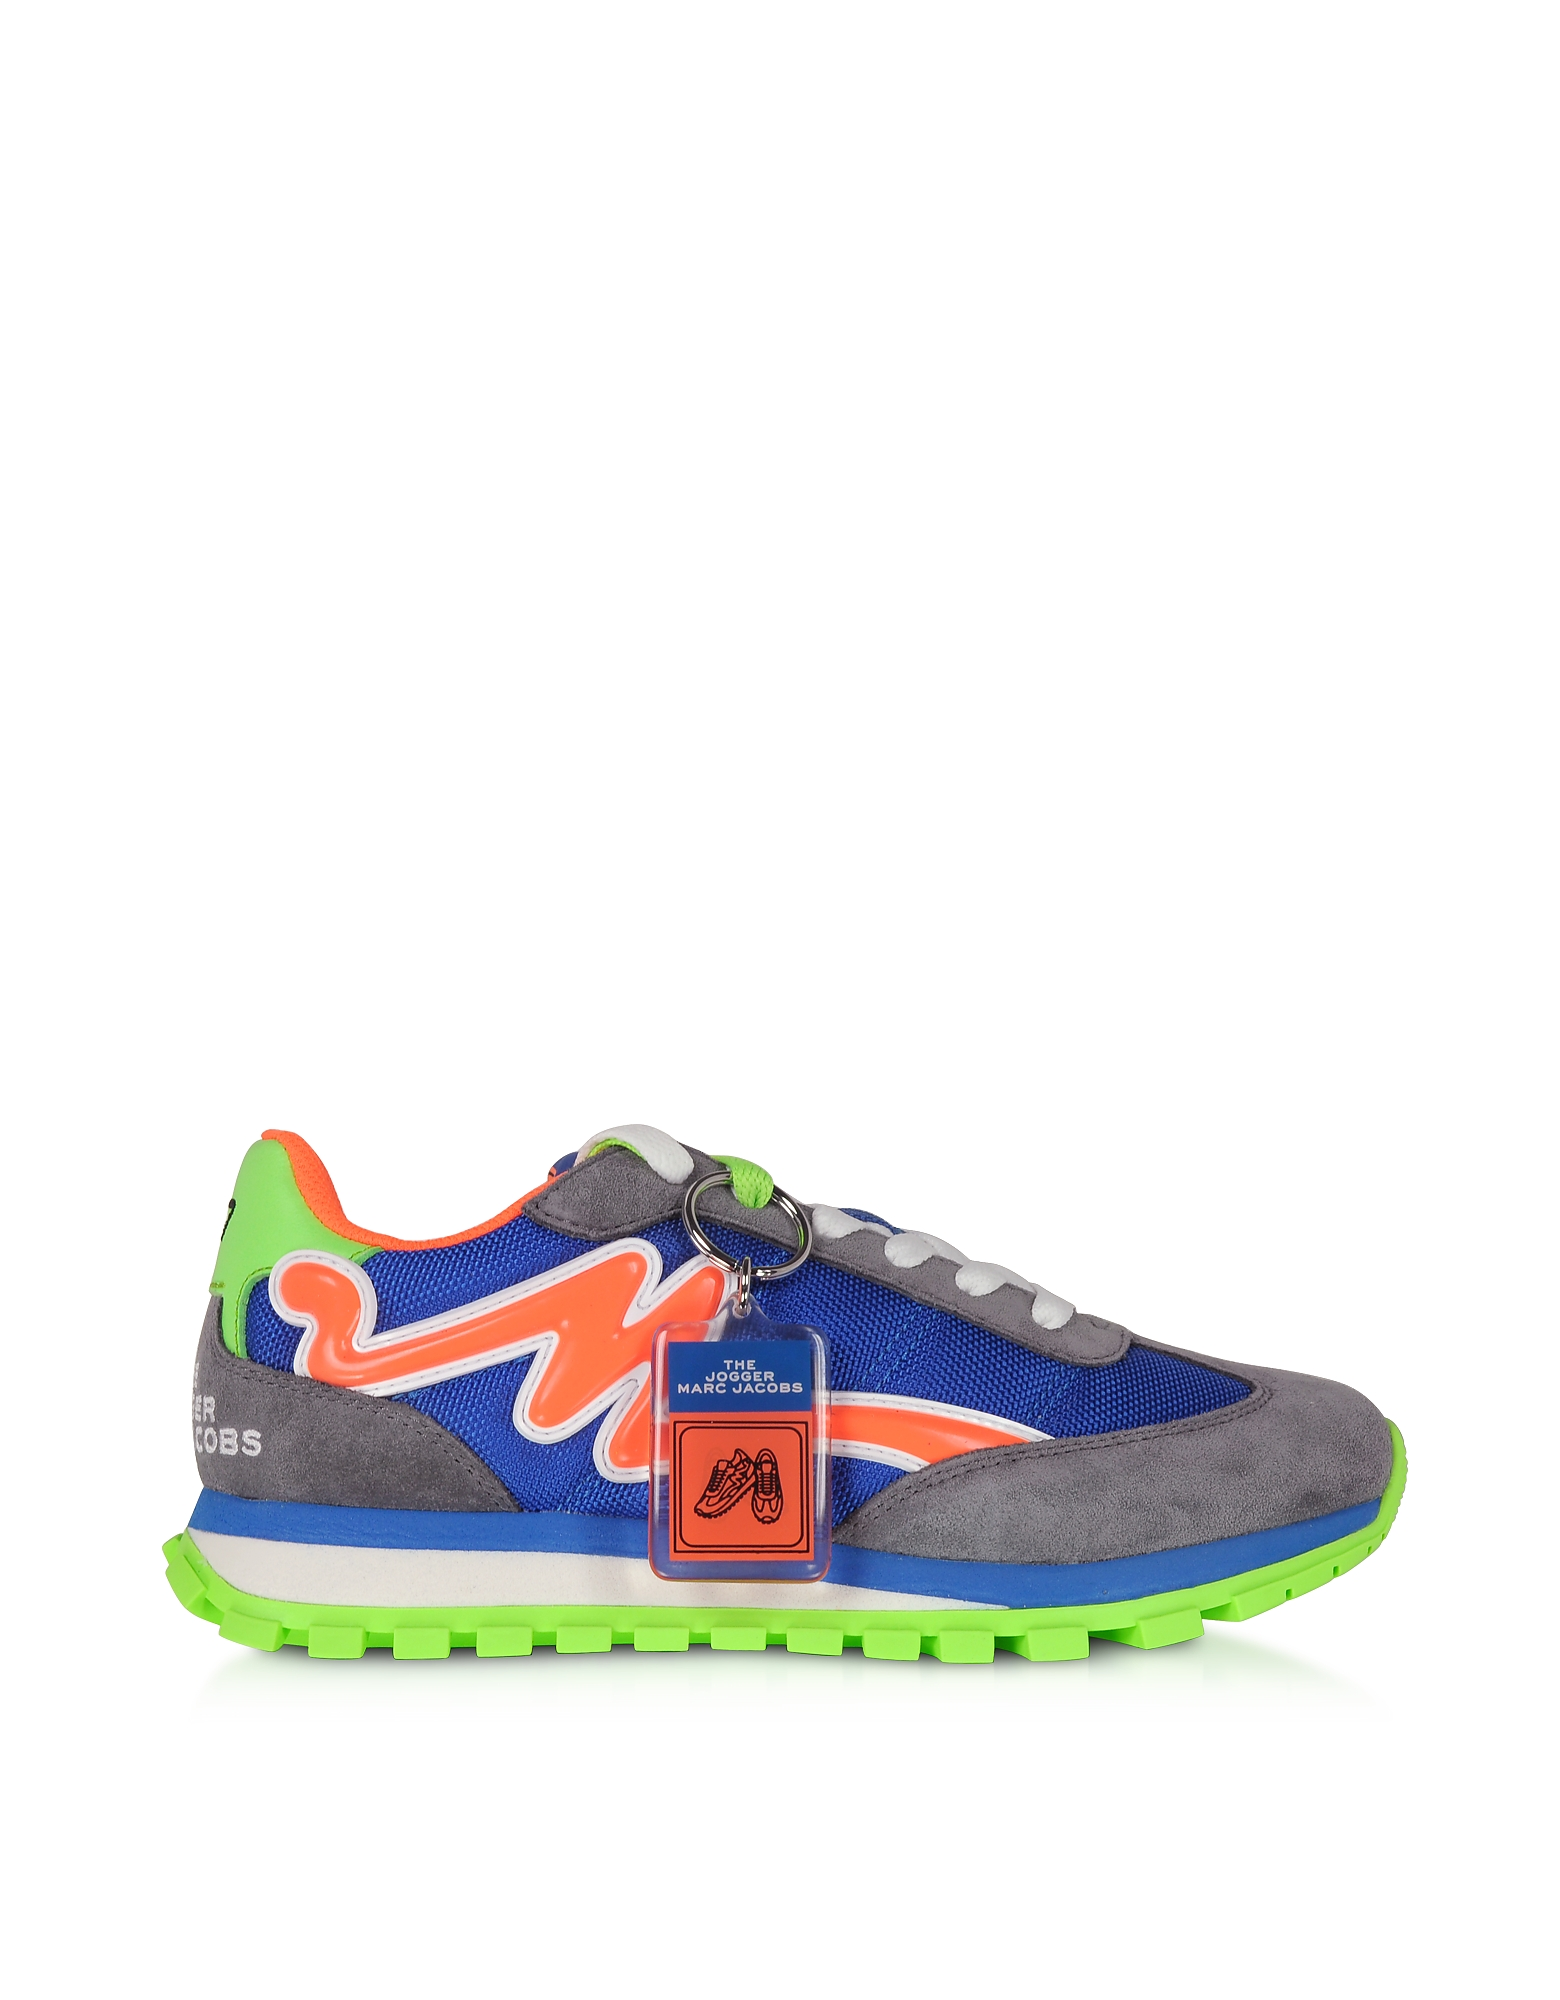 Marc Jacobs 雅克博 鞋履, 蜜桔和蓝色尼龙女士运动鞋